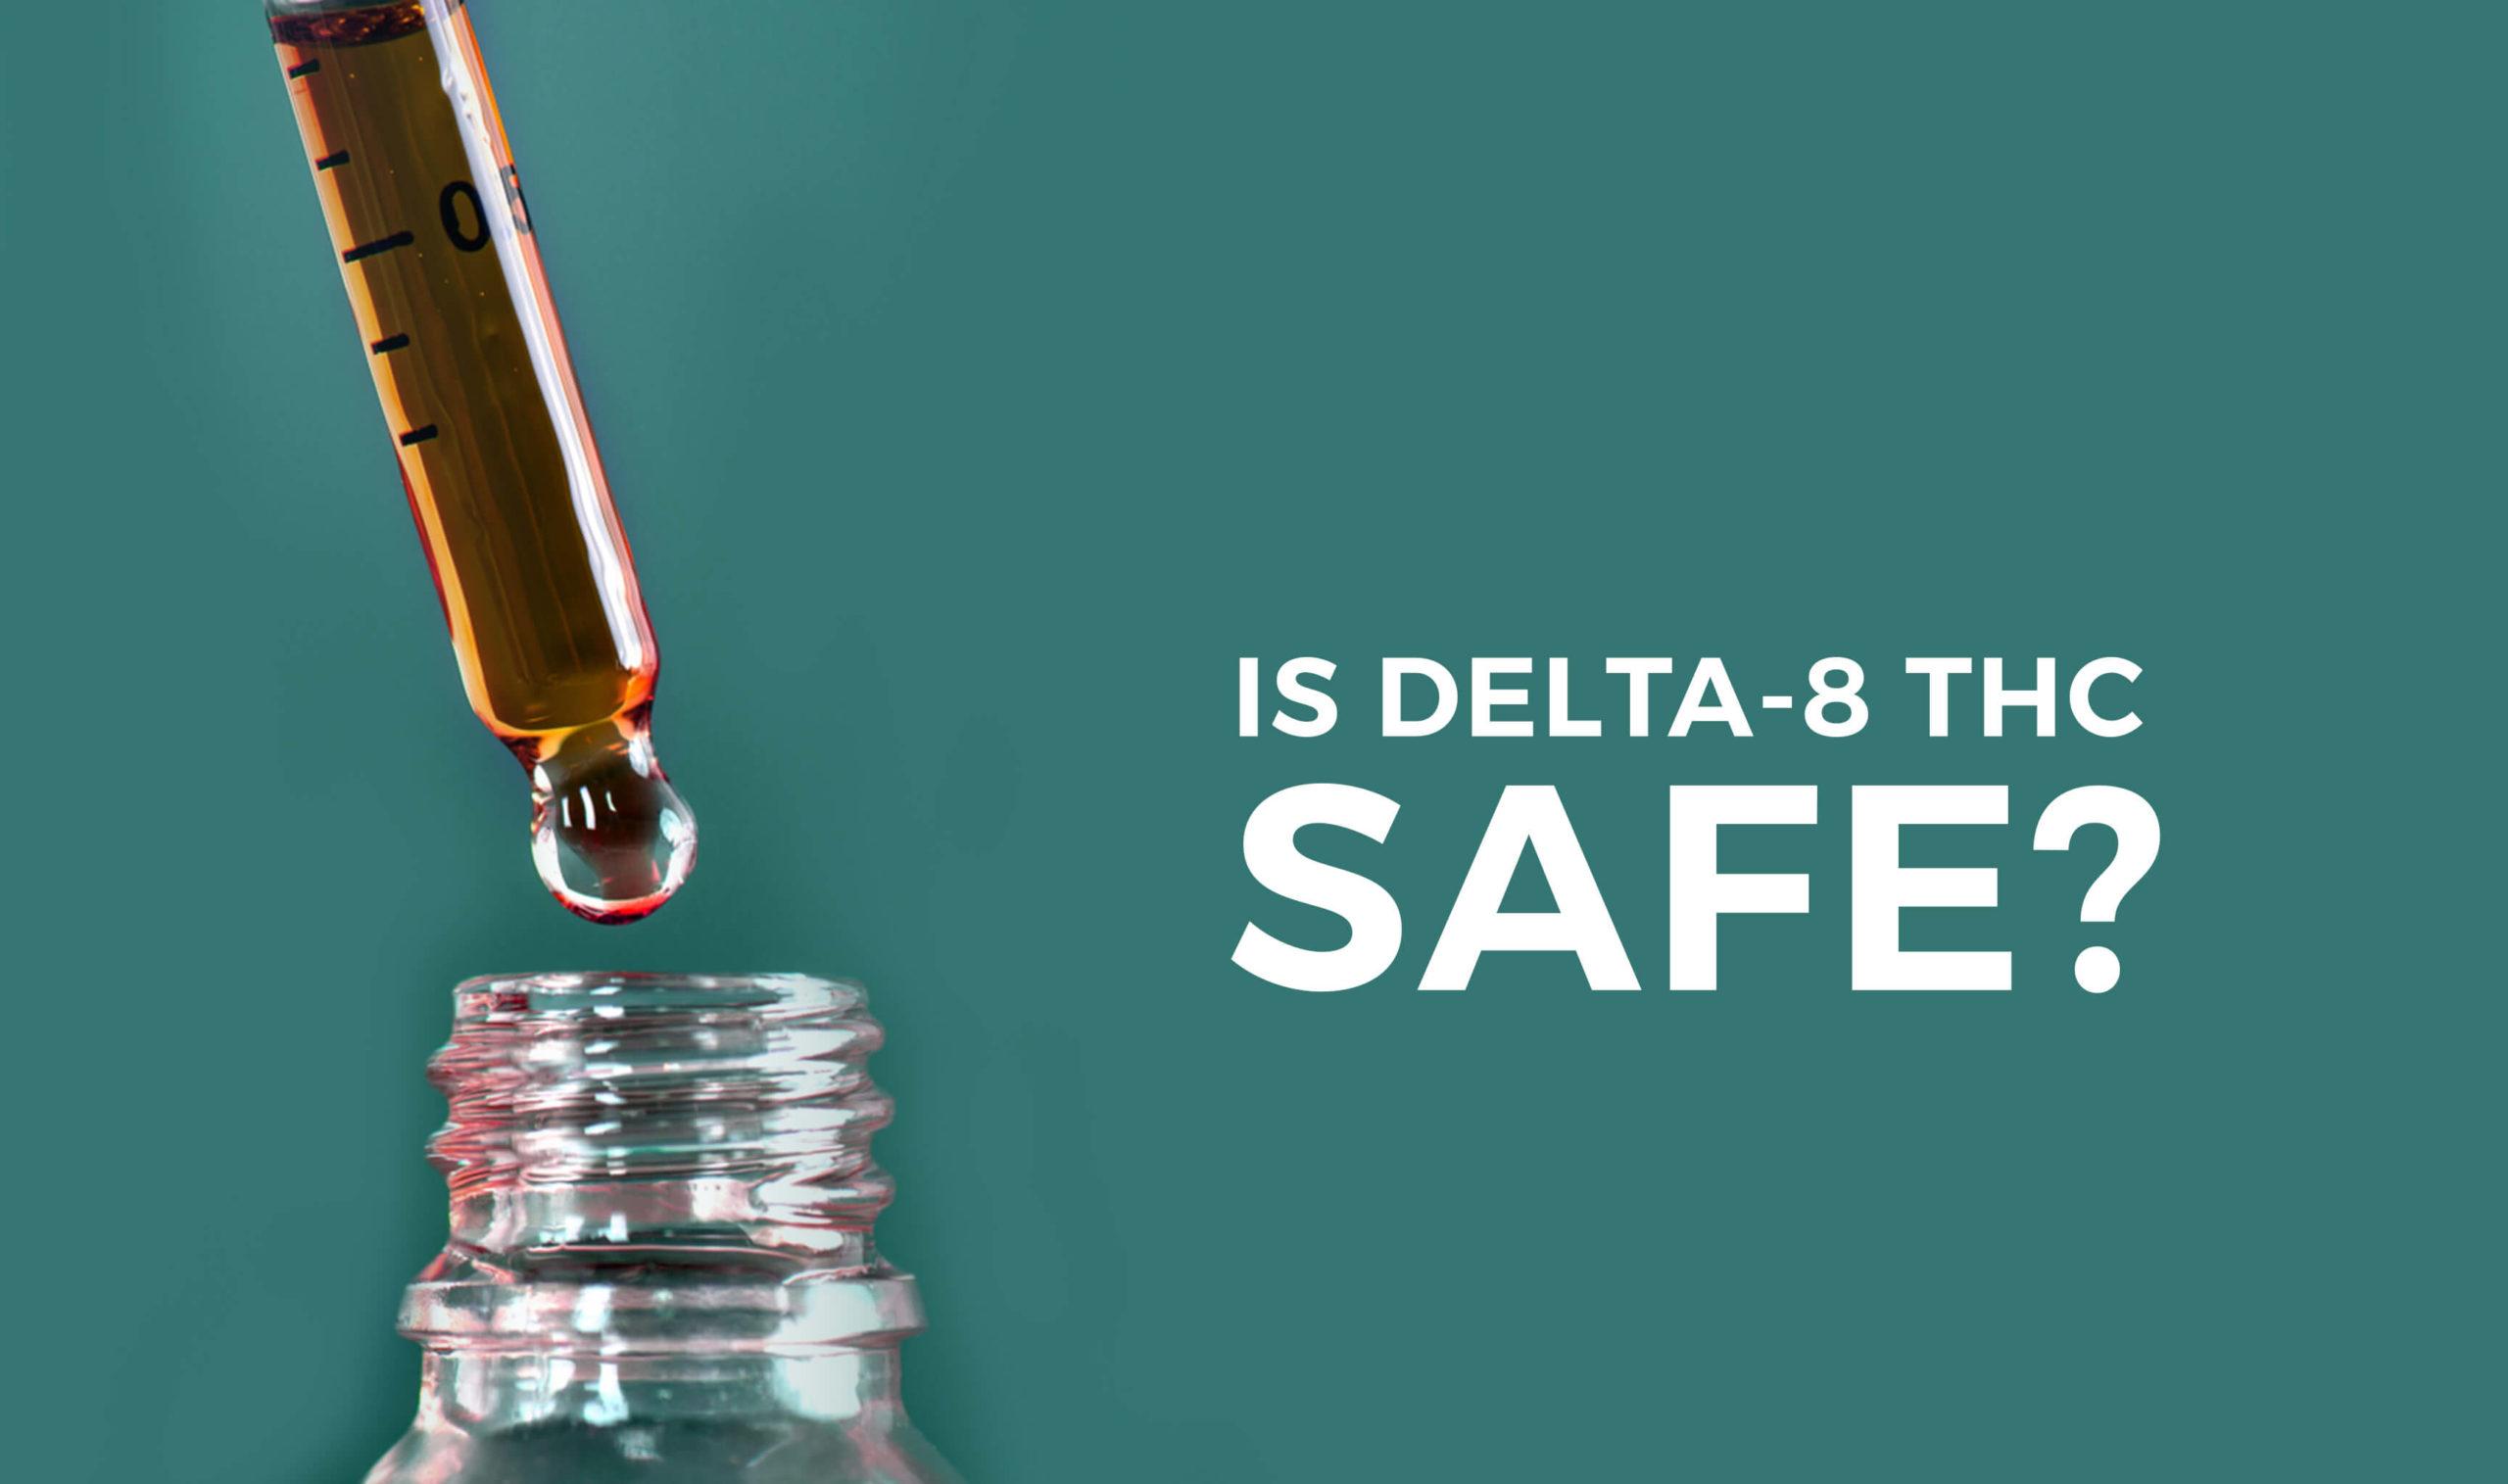 Is Delta-8 THC Safe